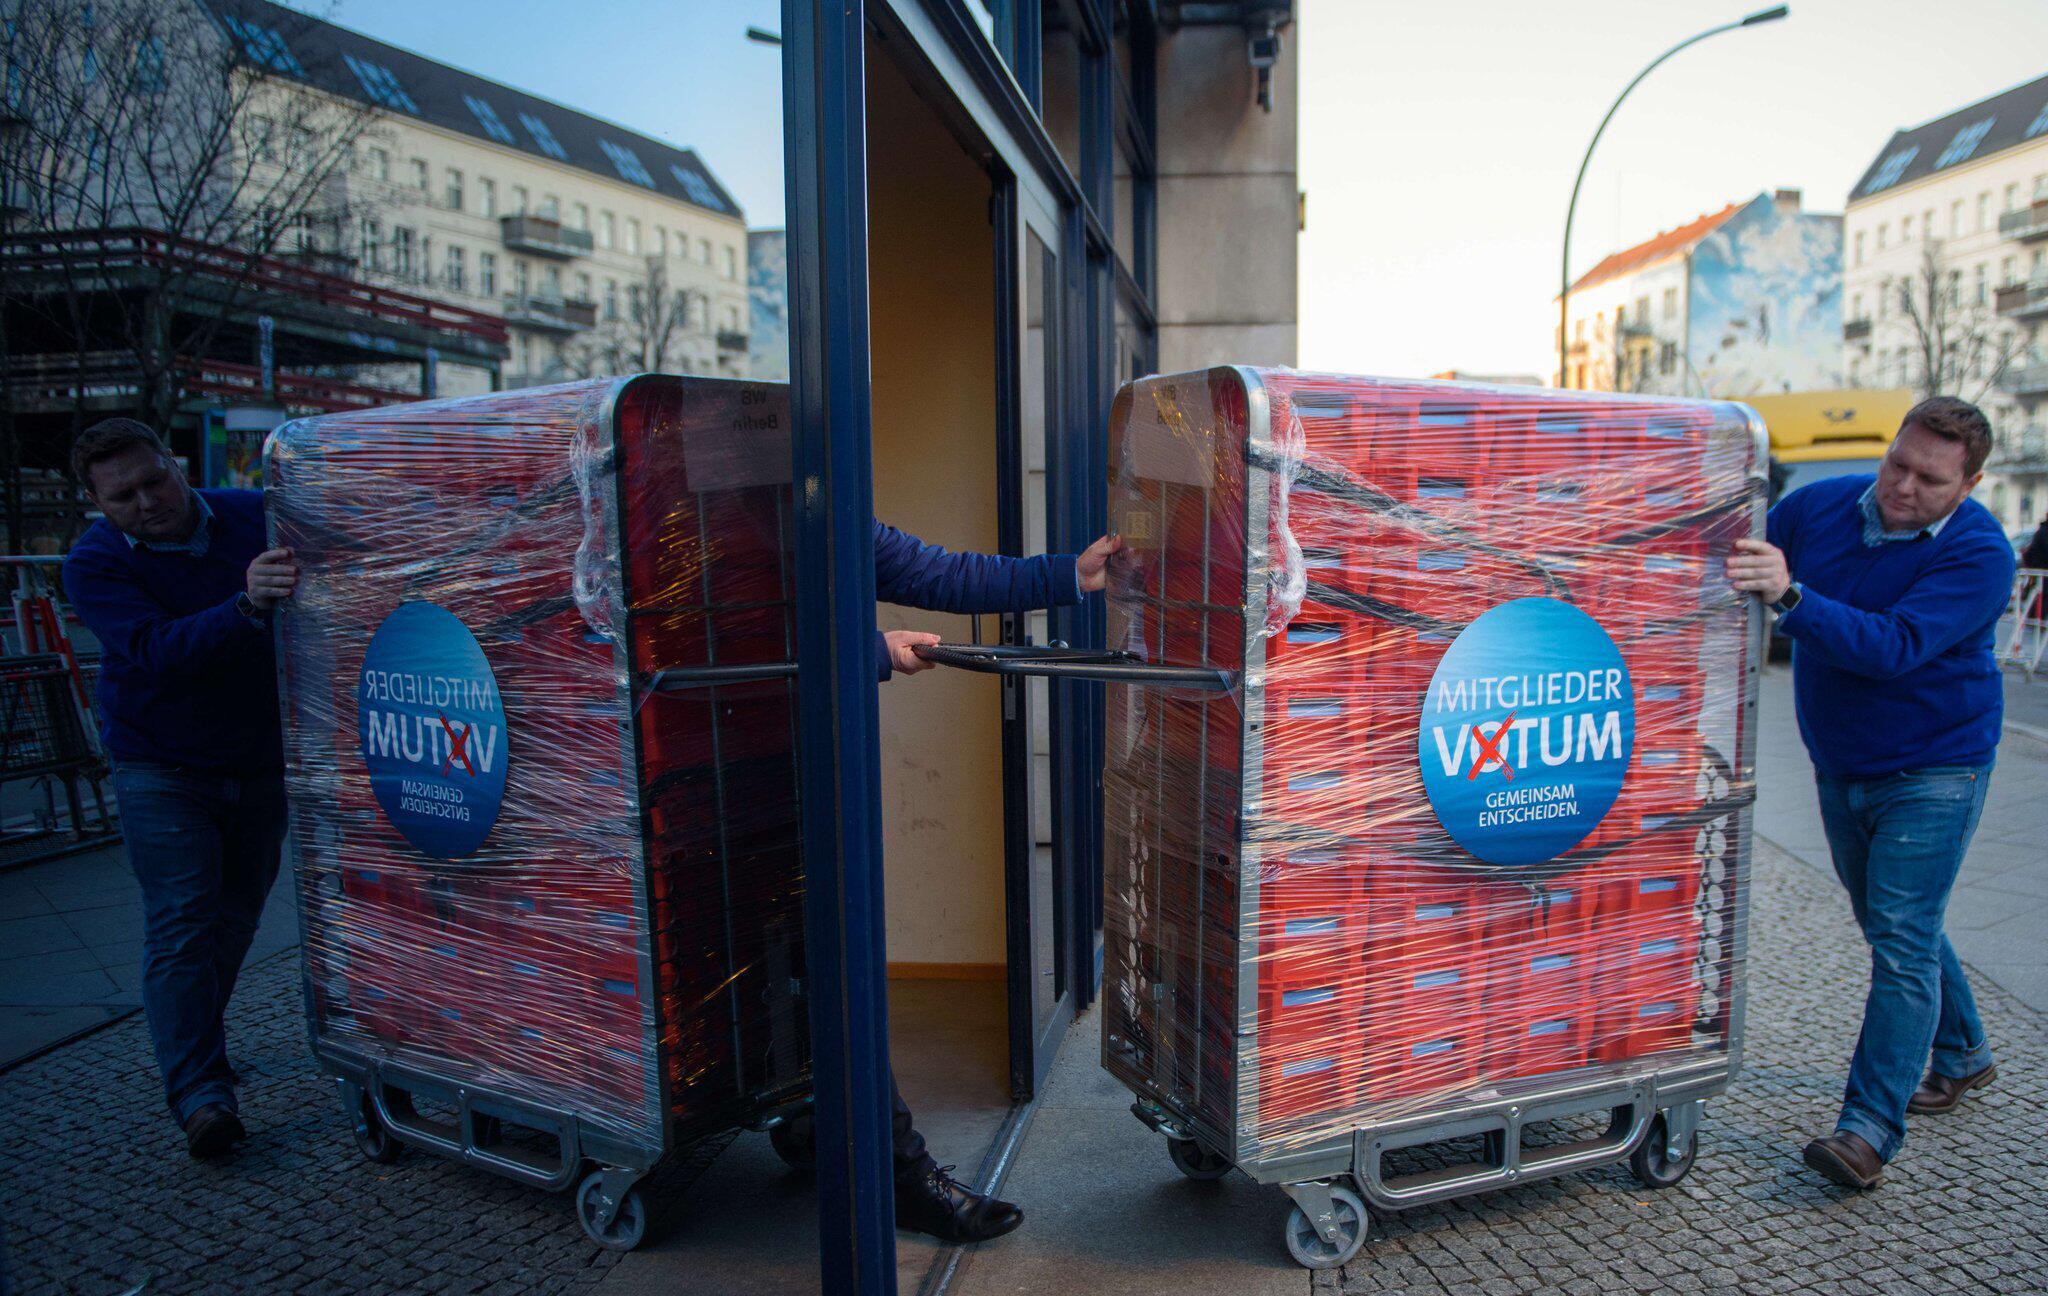 Bild zu SPD member's vote